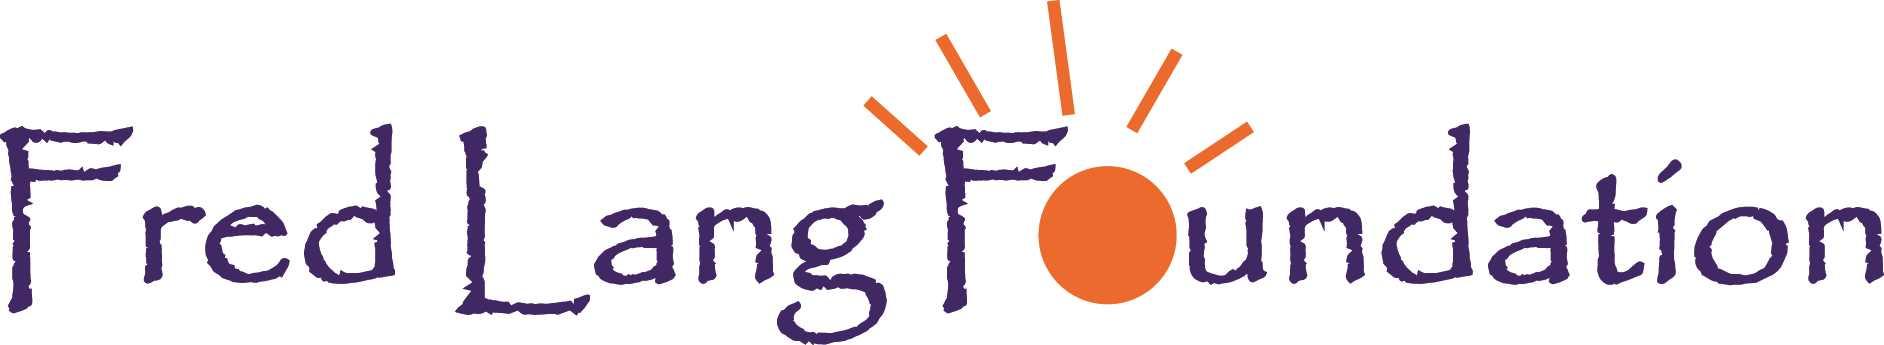 Fred Lang Foundation logo